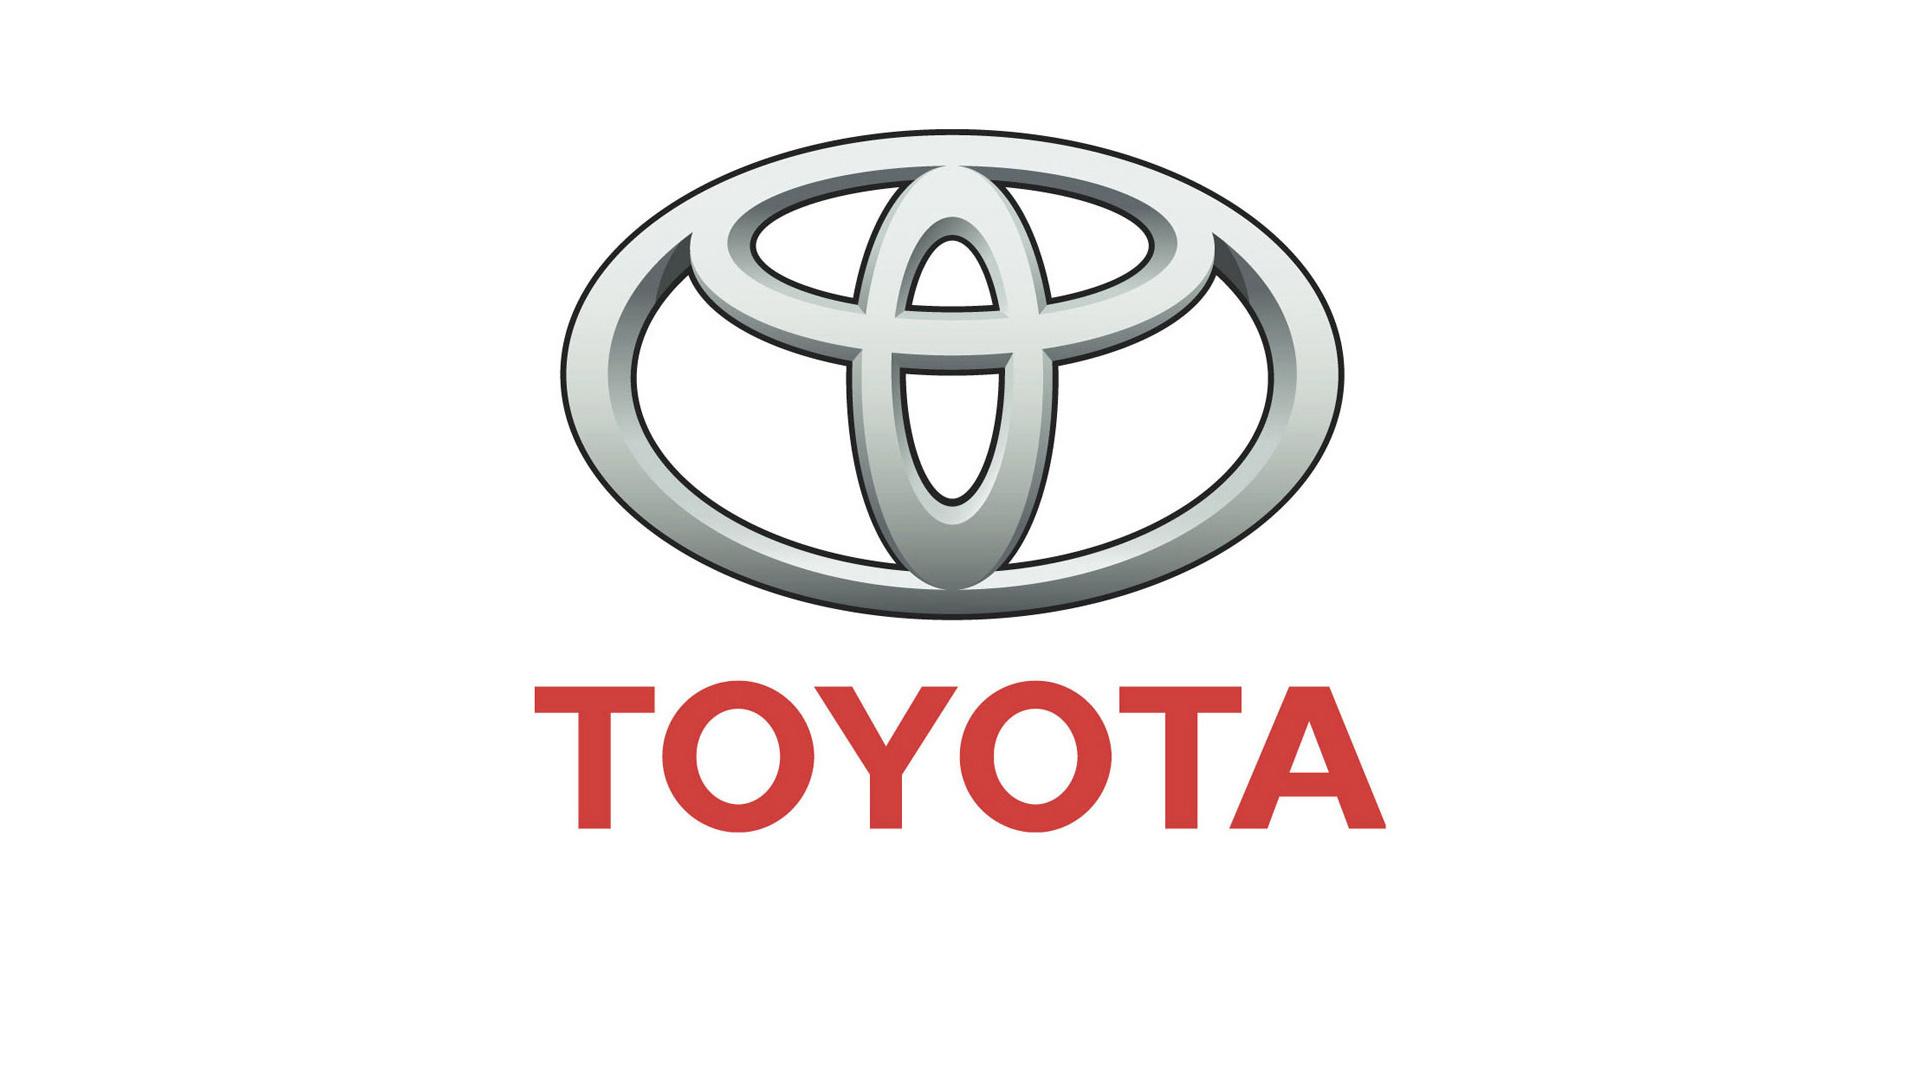 1920x1080 Brands Toyota Toyota Backgrounds Cars Logo 1920x1080